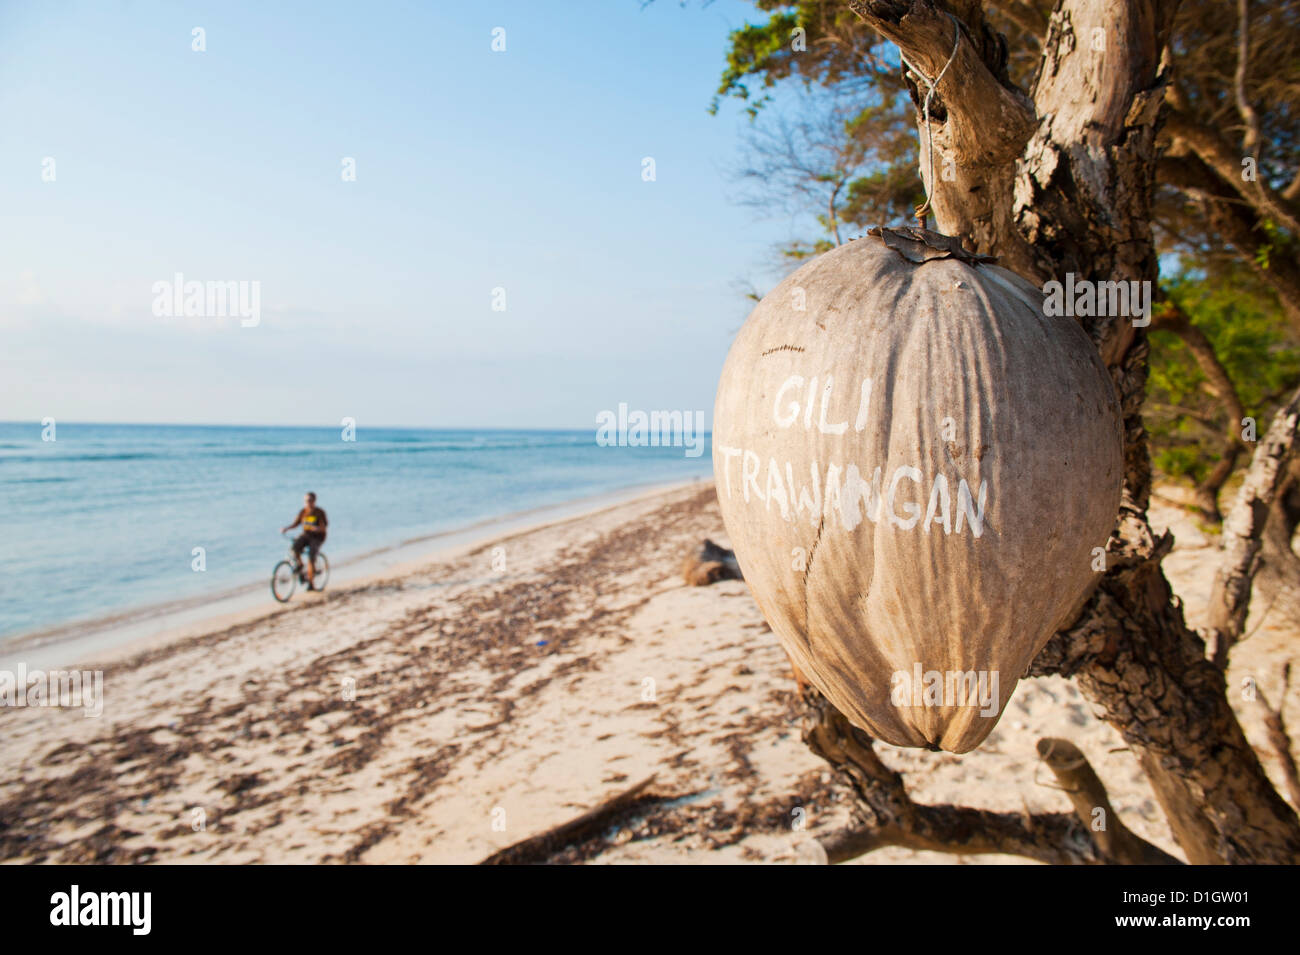 Gili Trawangan written on a coconut, Gili Islands, Indonesia, Southeast Asia, Asia - Stock Image